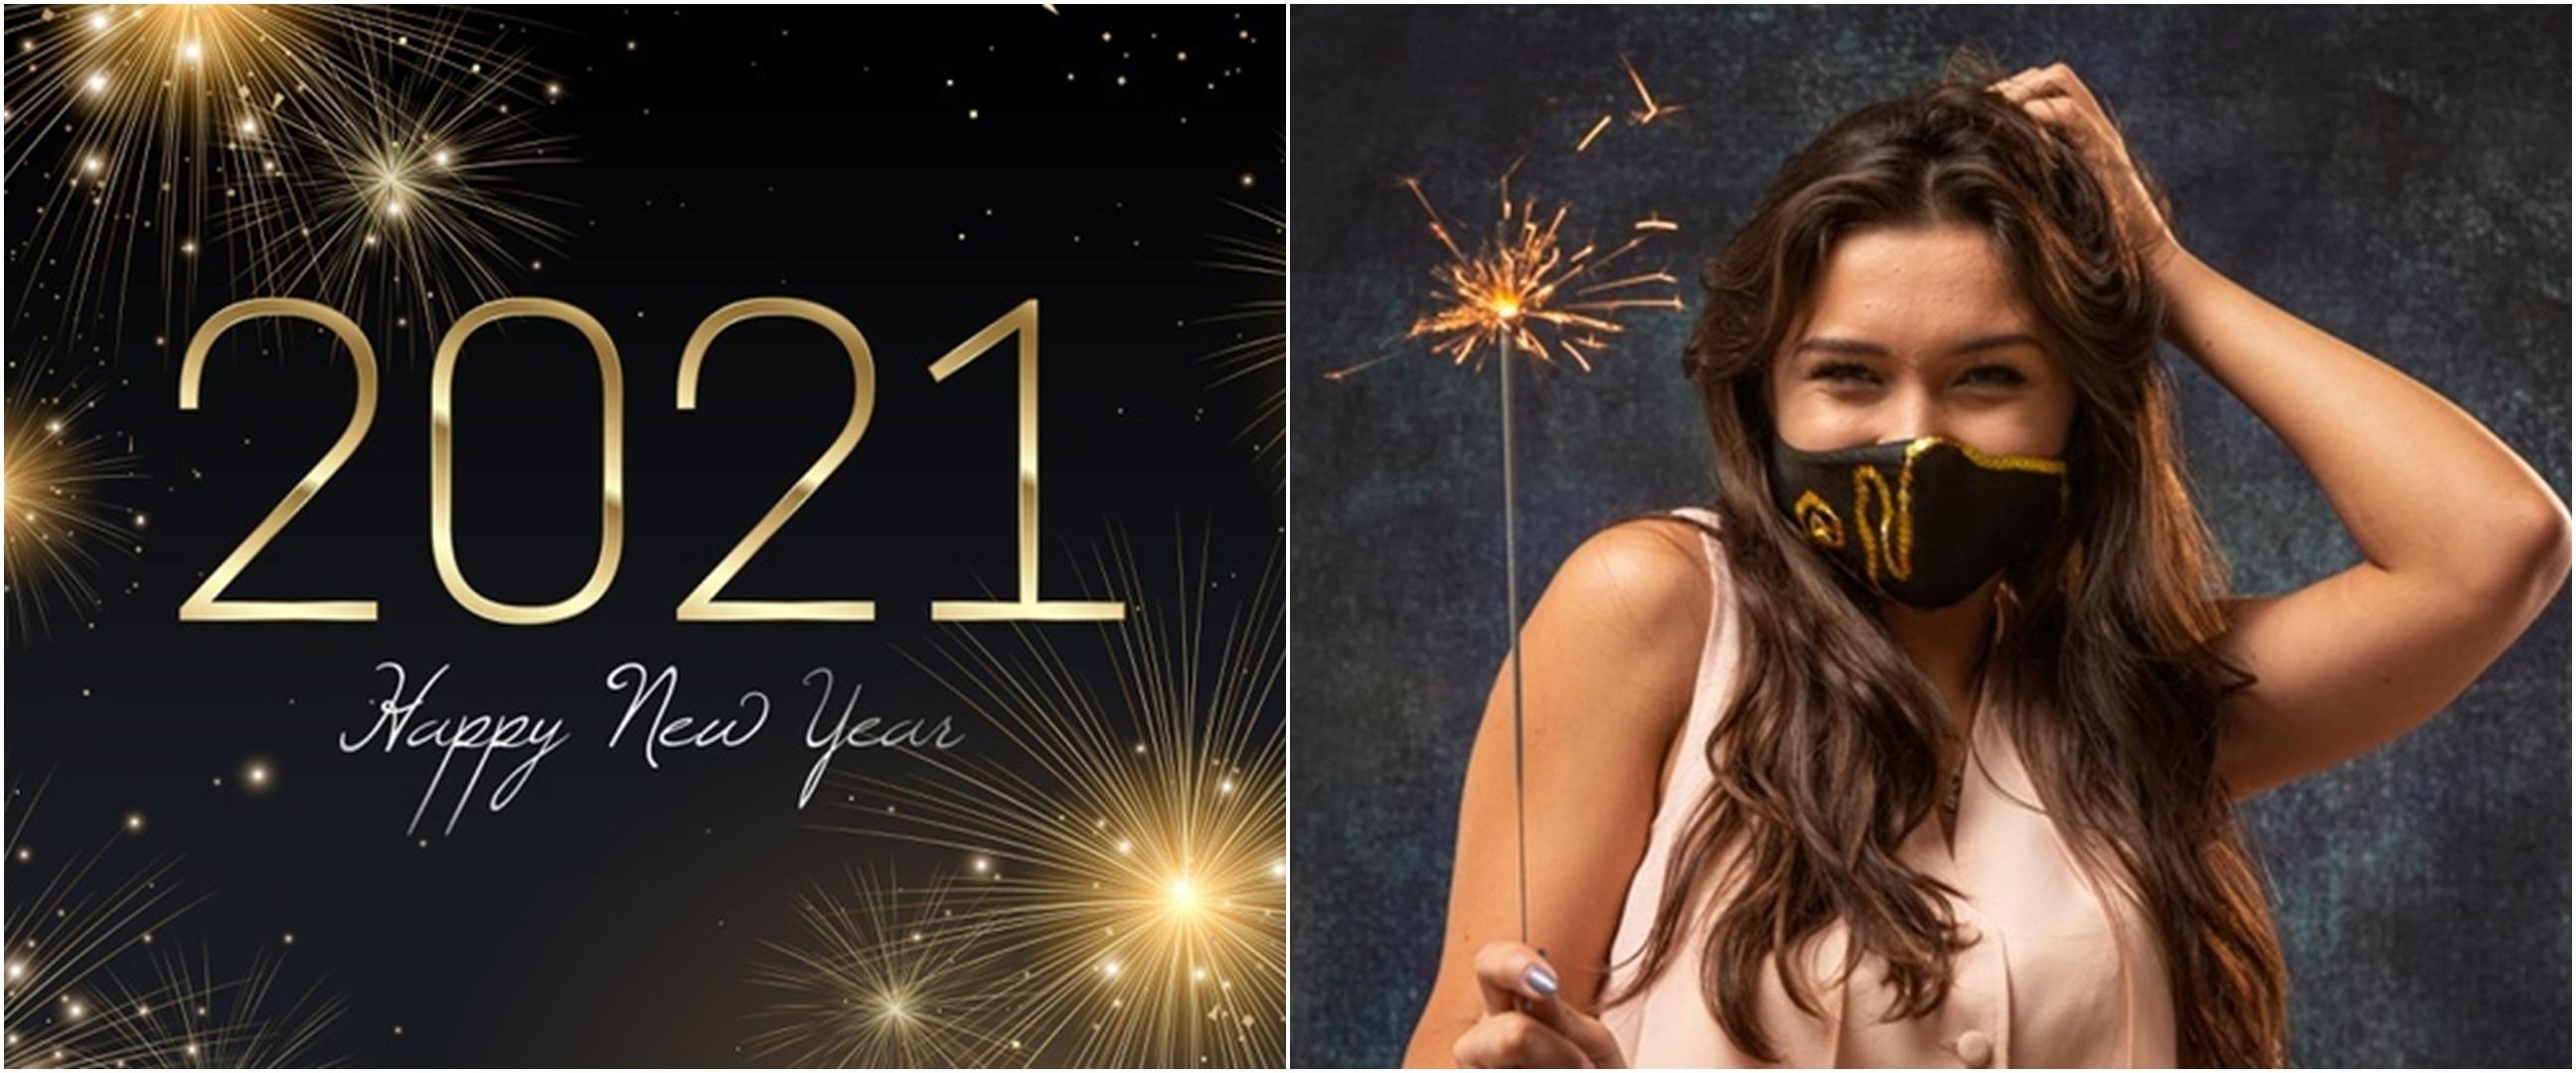 40 Ucapan selamat Tahun Baru 2021 dalam bahasa Inggris, penuh motivasi